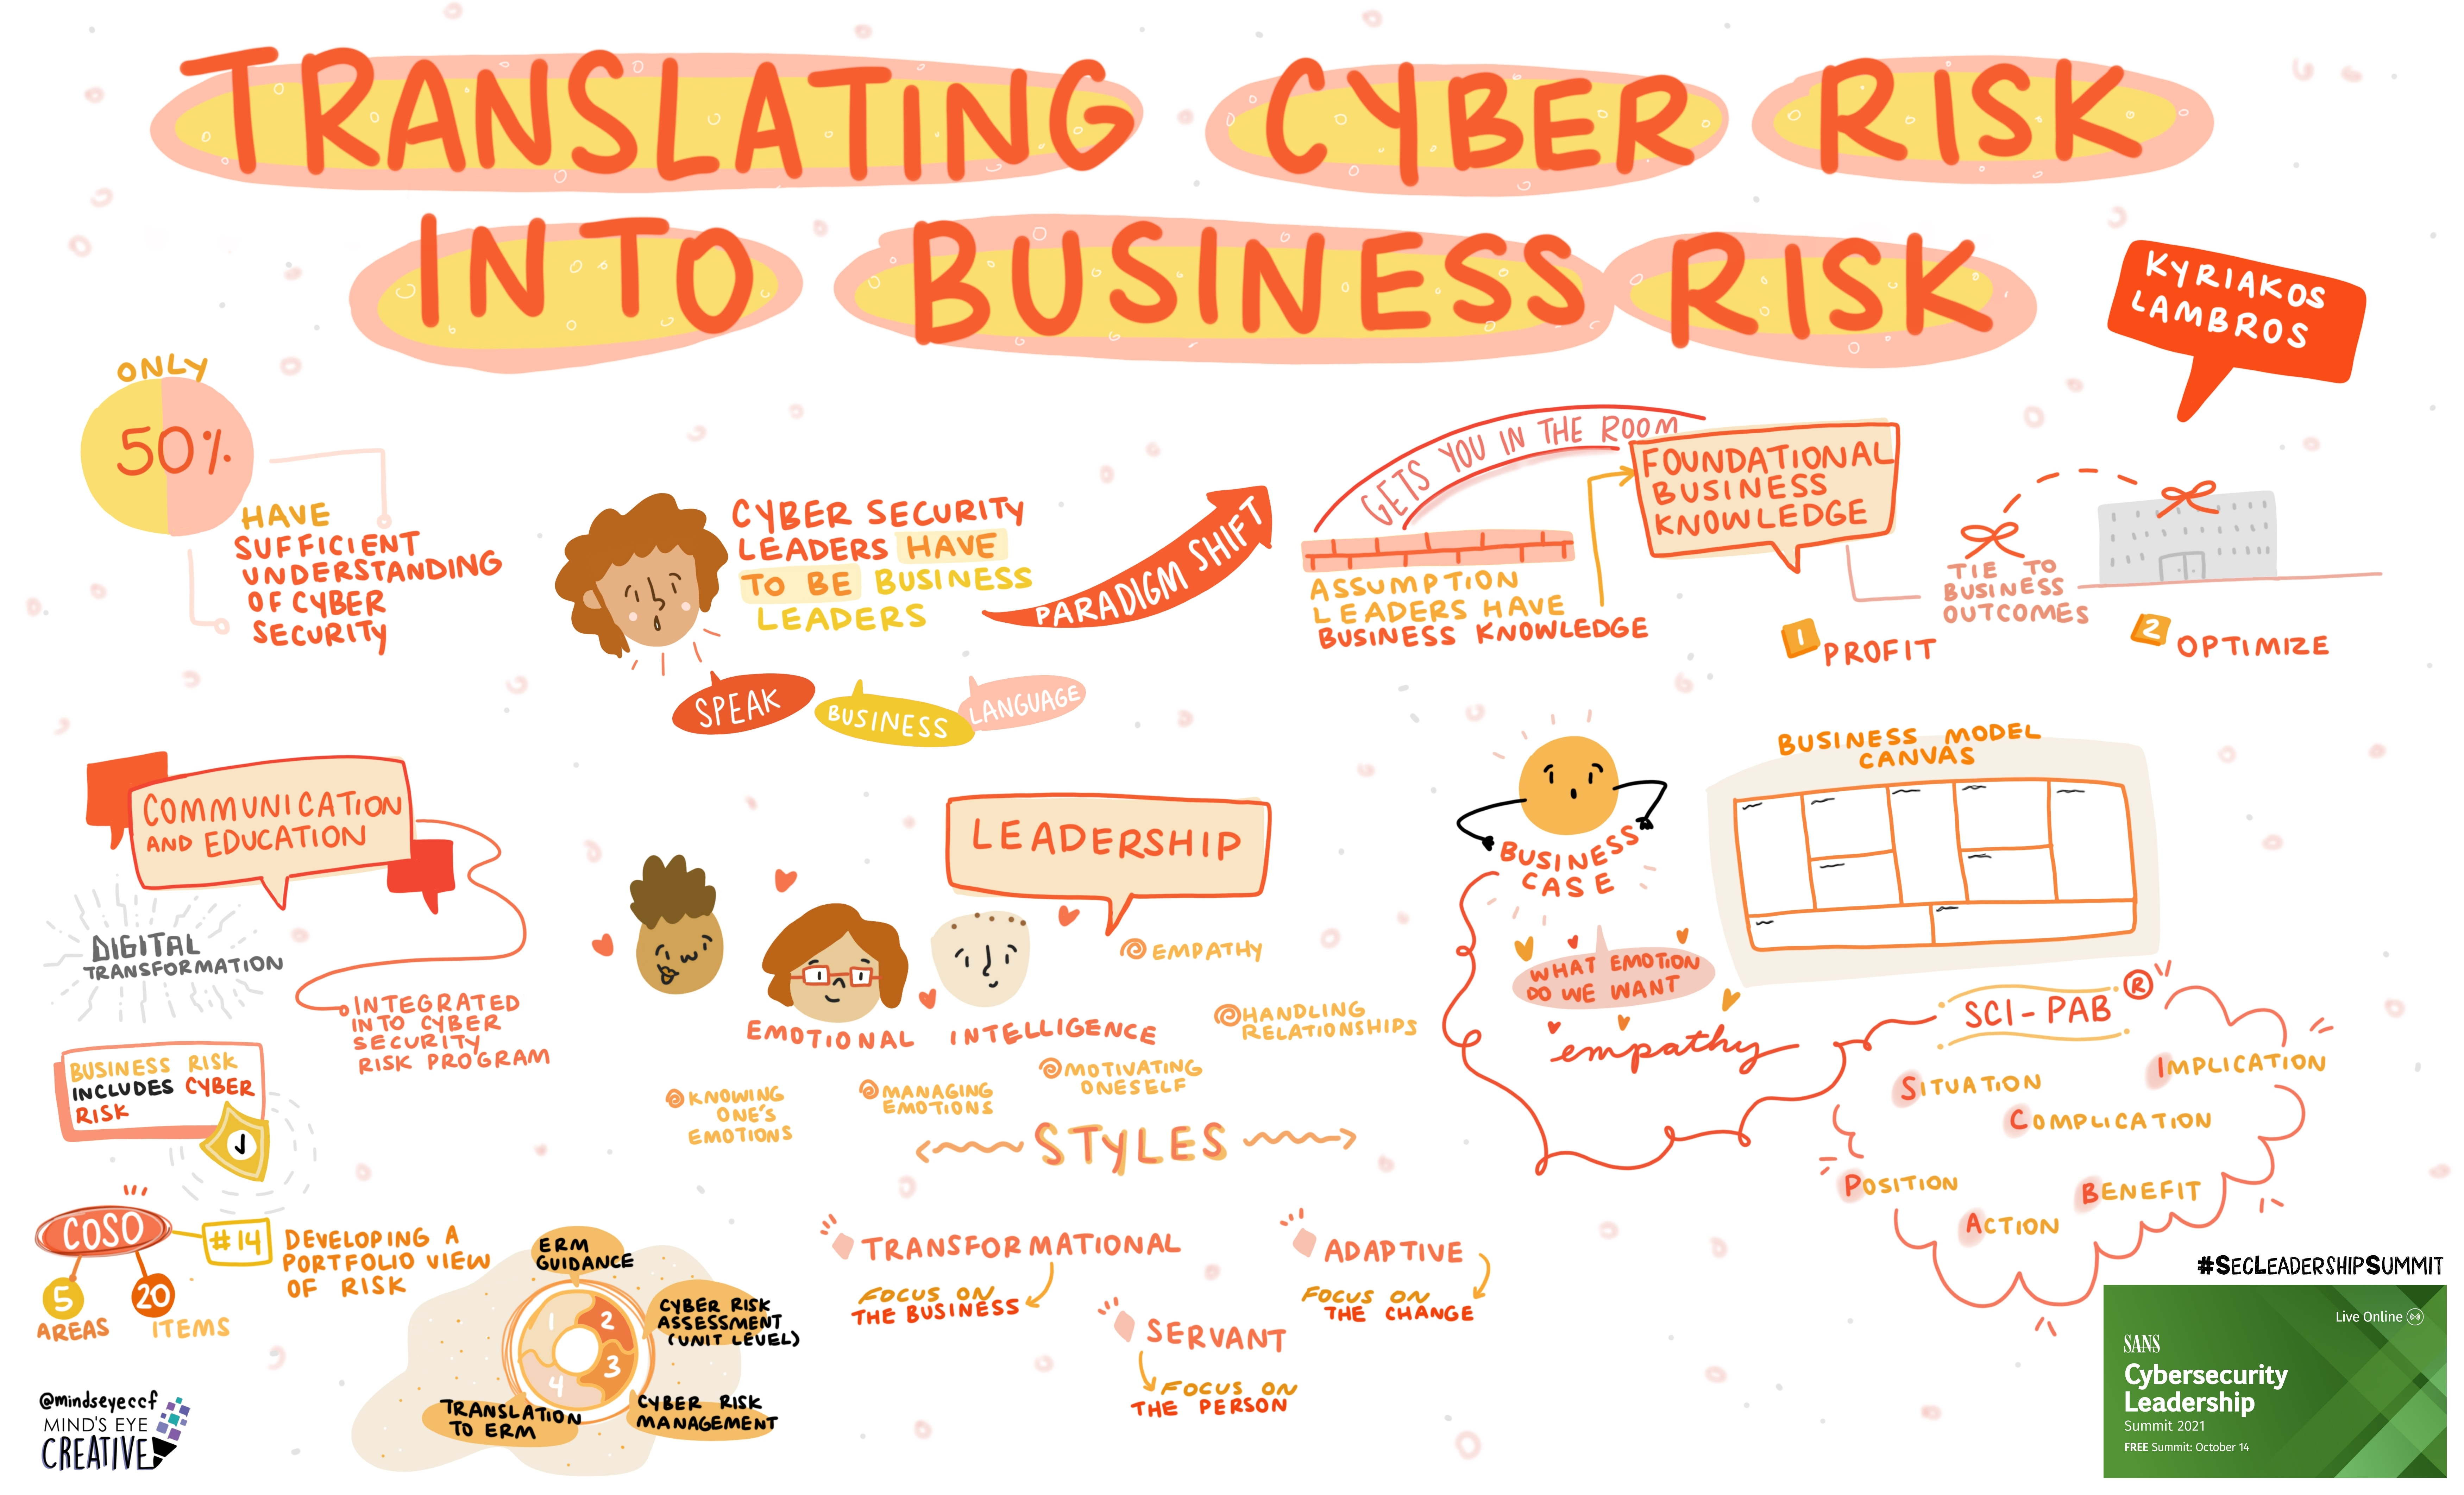 01_CyberSecurityLeadership_Kyriakos_Lambros.jpg